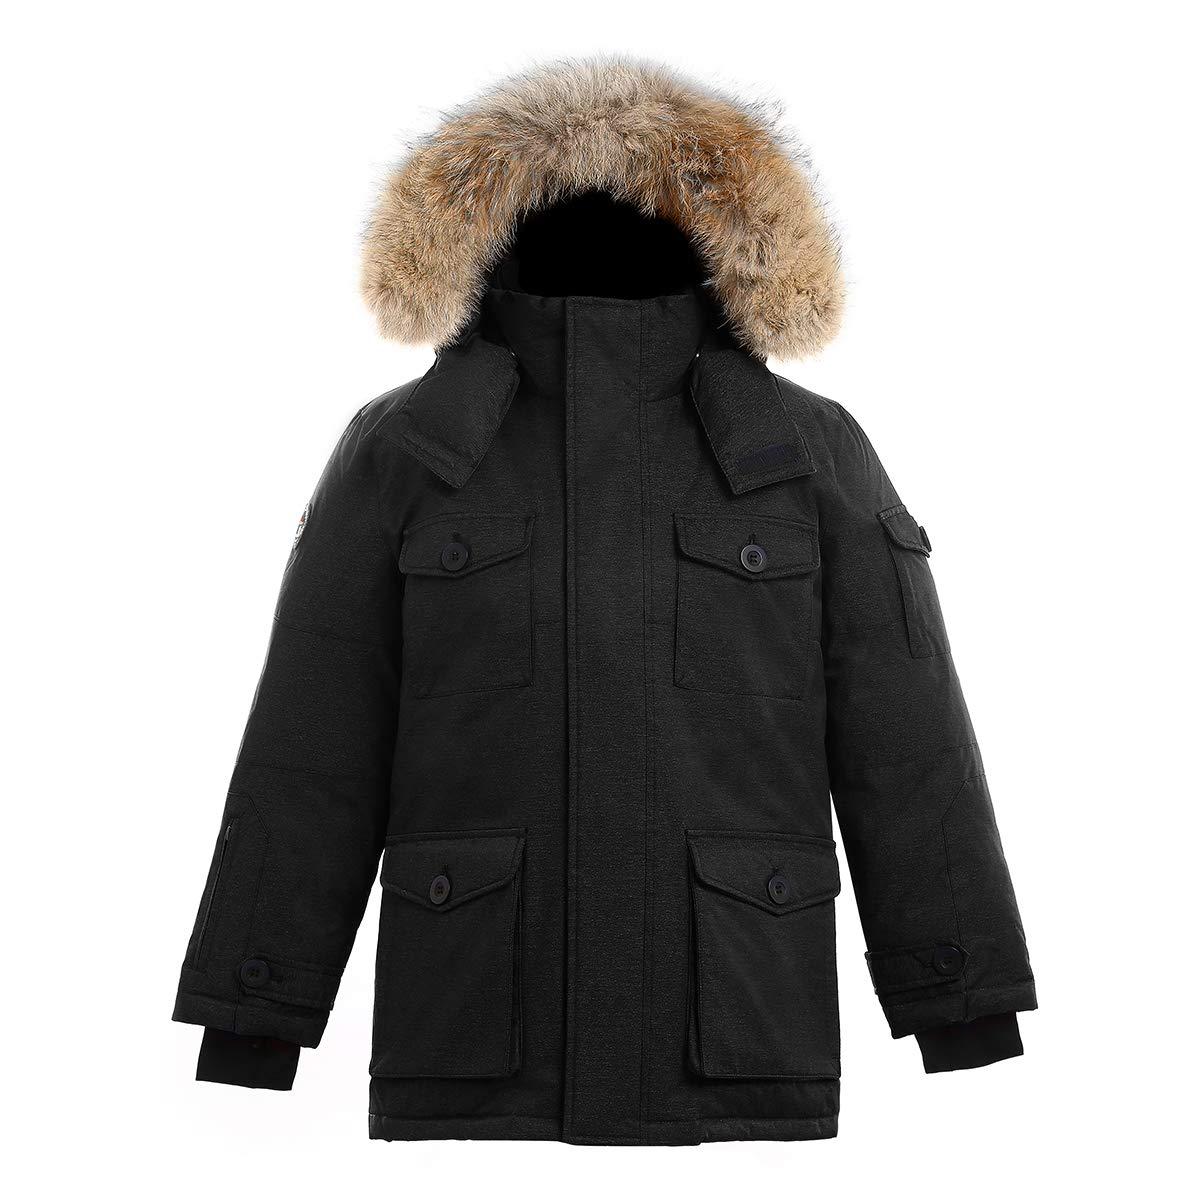 Triple F.A.T. Goose SAGA Collection   Eldridge Boys Parka Jacket (8/10, Black)